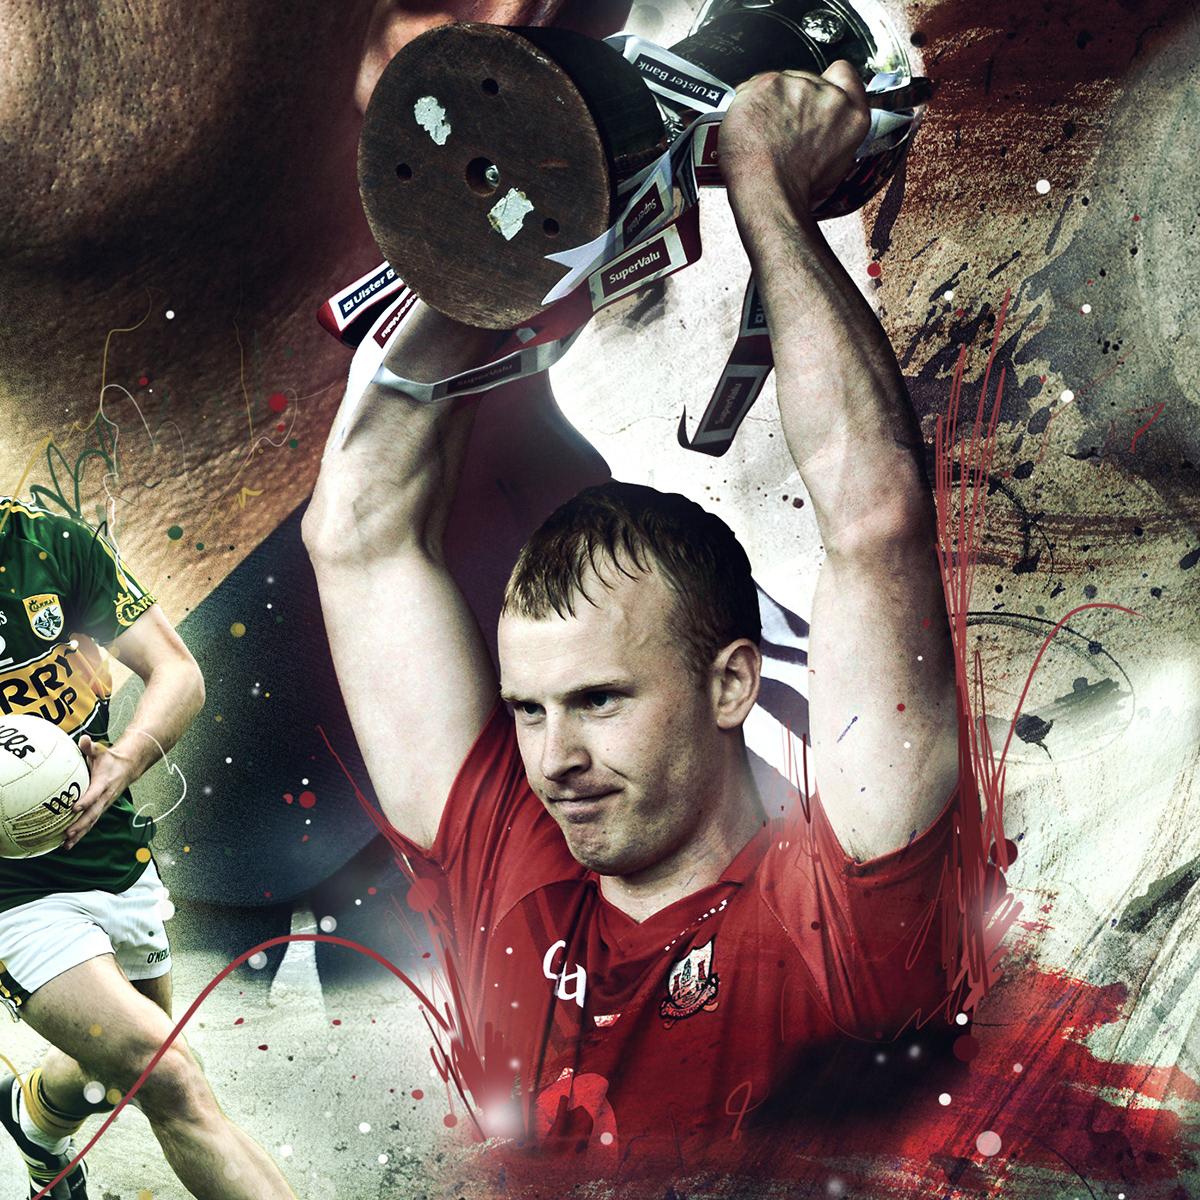 hurling football gaelic GAA irish sport münster munster championships gaelic football